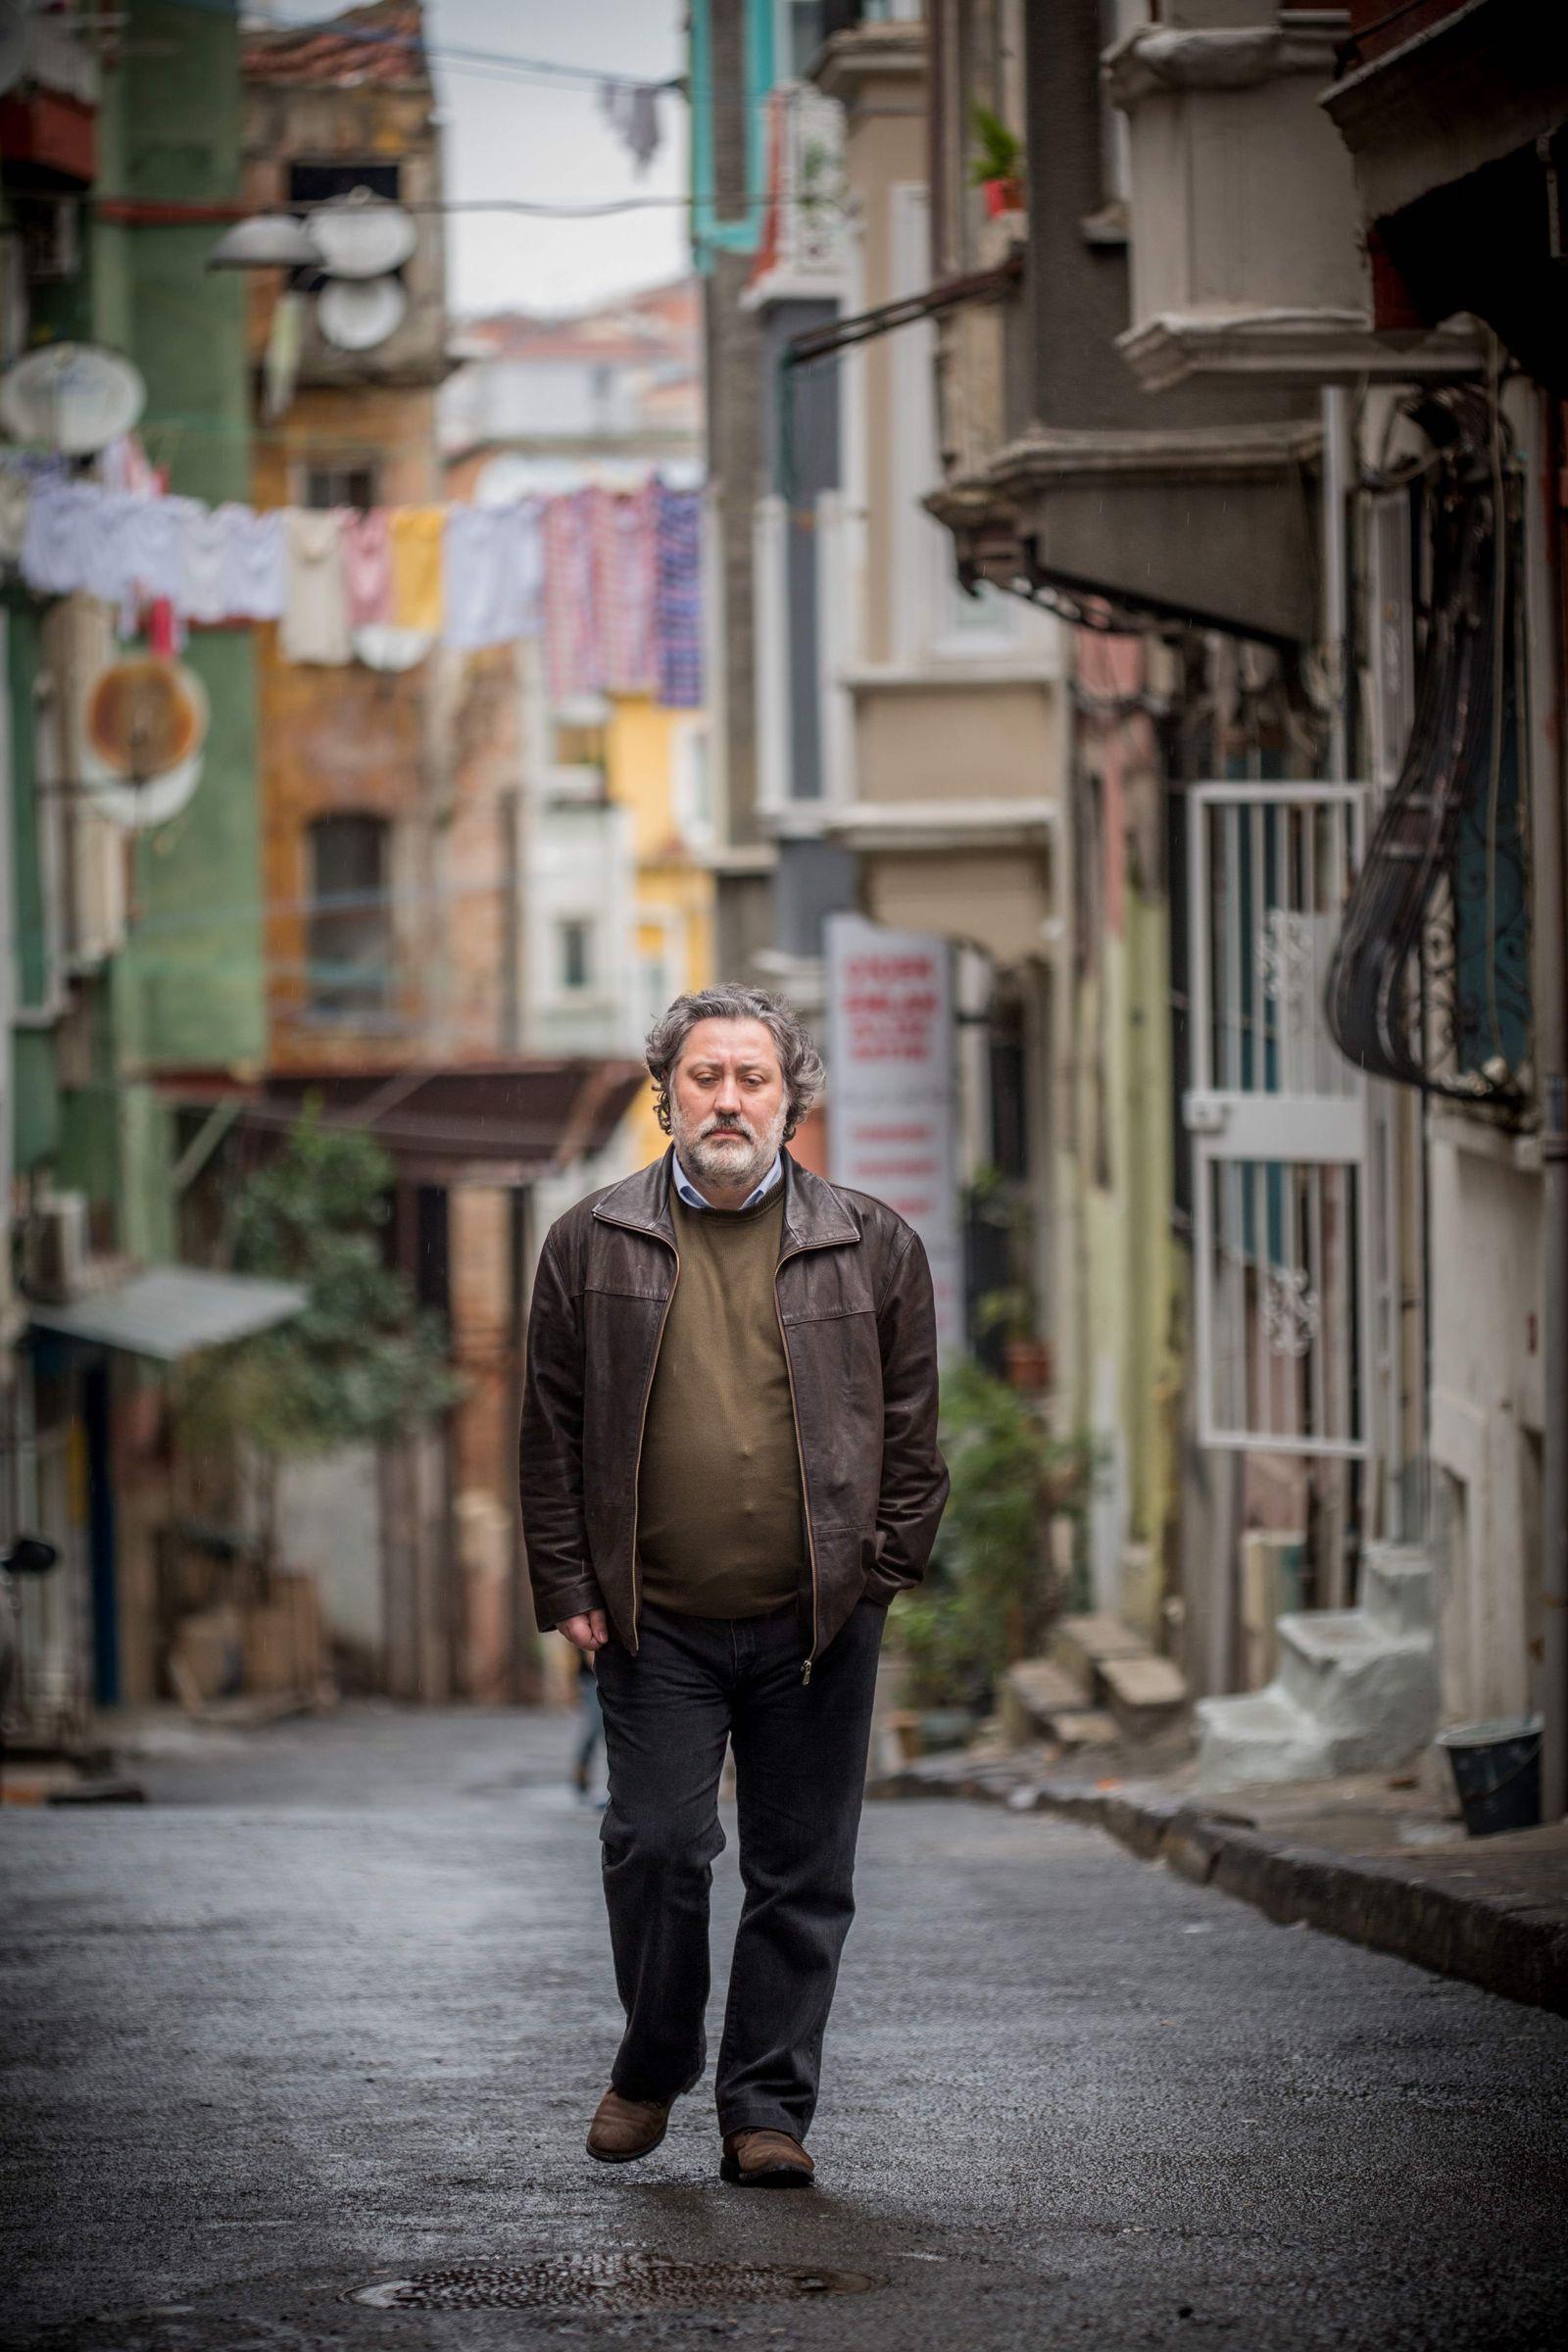 EINMALIGE VERWENDUNG Murat Sabuncu/ Türkei/ Erdogan/ Cumhuriyet/ Verhaftung